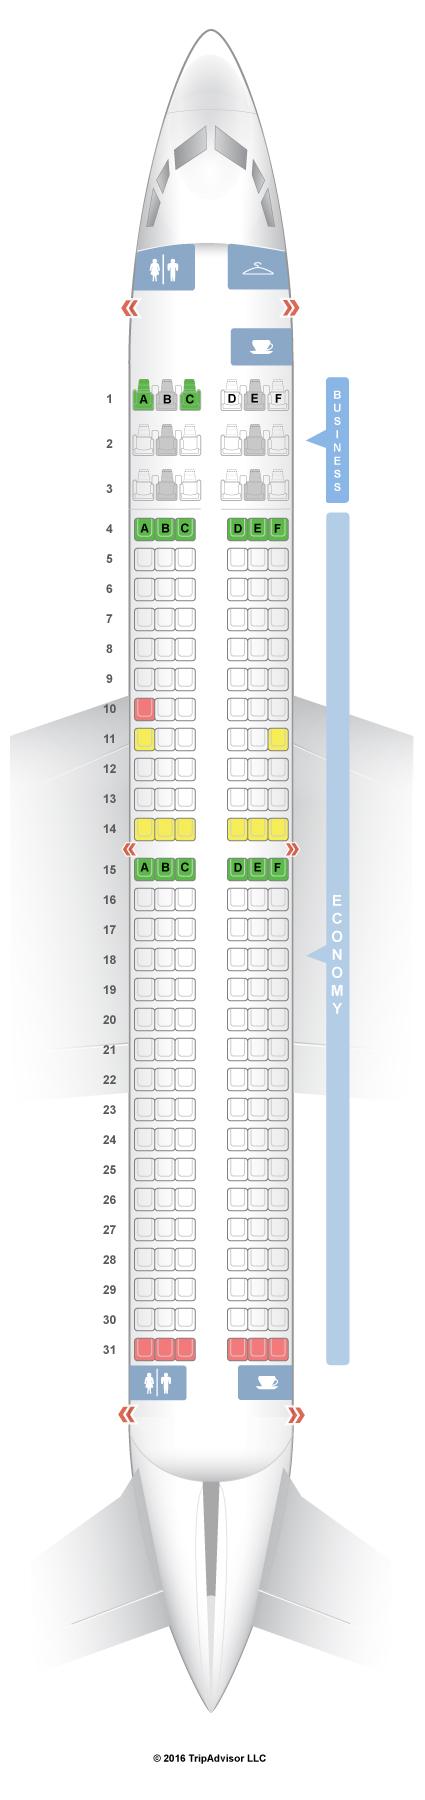 Seatguru Seat Map Air Europa Boeing 737 800 738